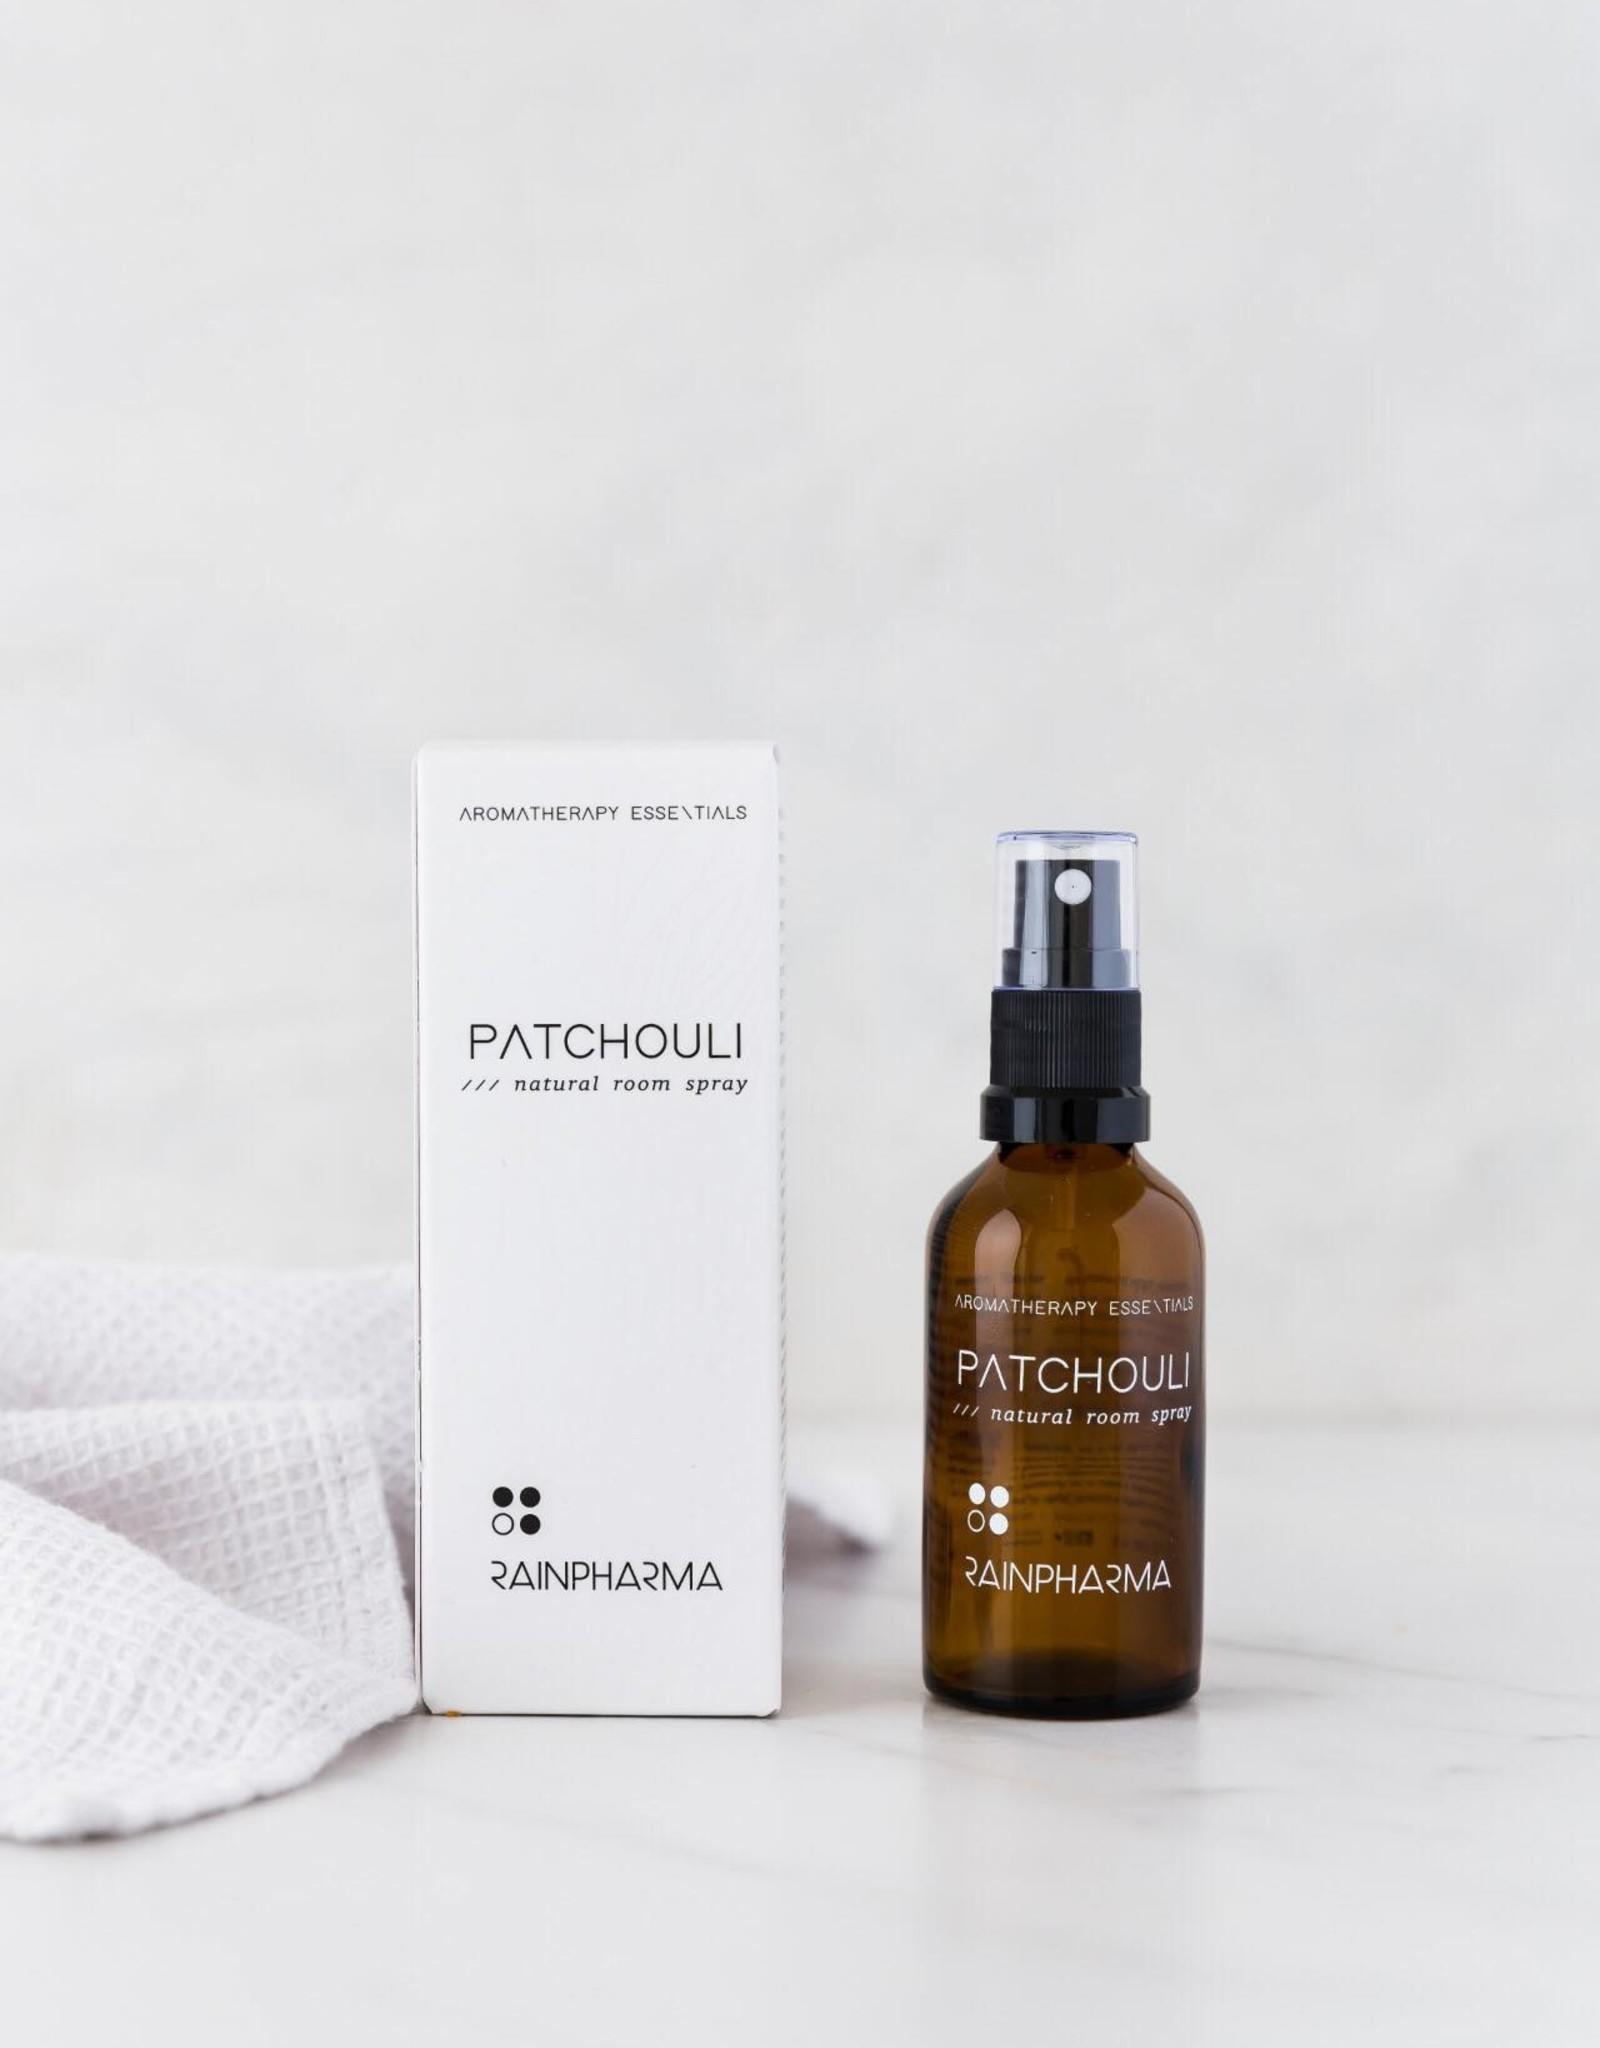 RainPharma Natural Room Spray Patchouli 50ml - Rainpharma